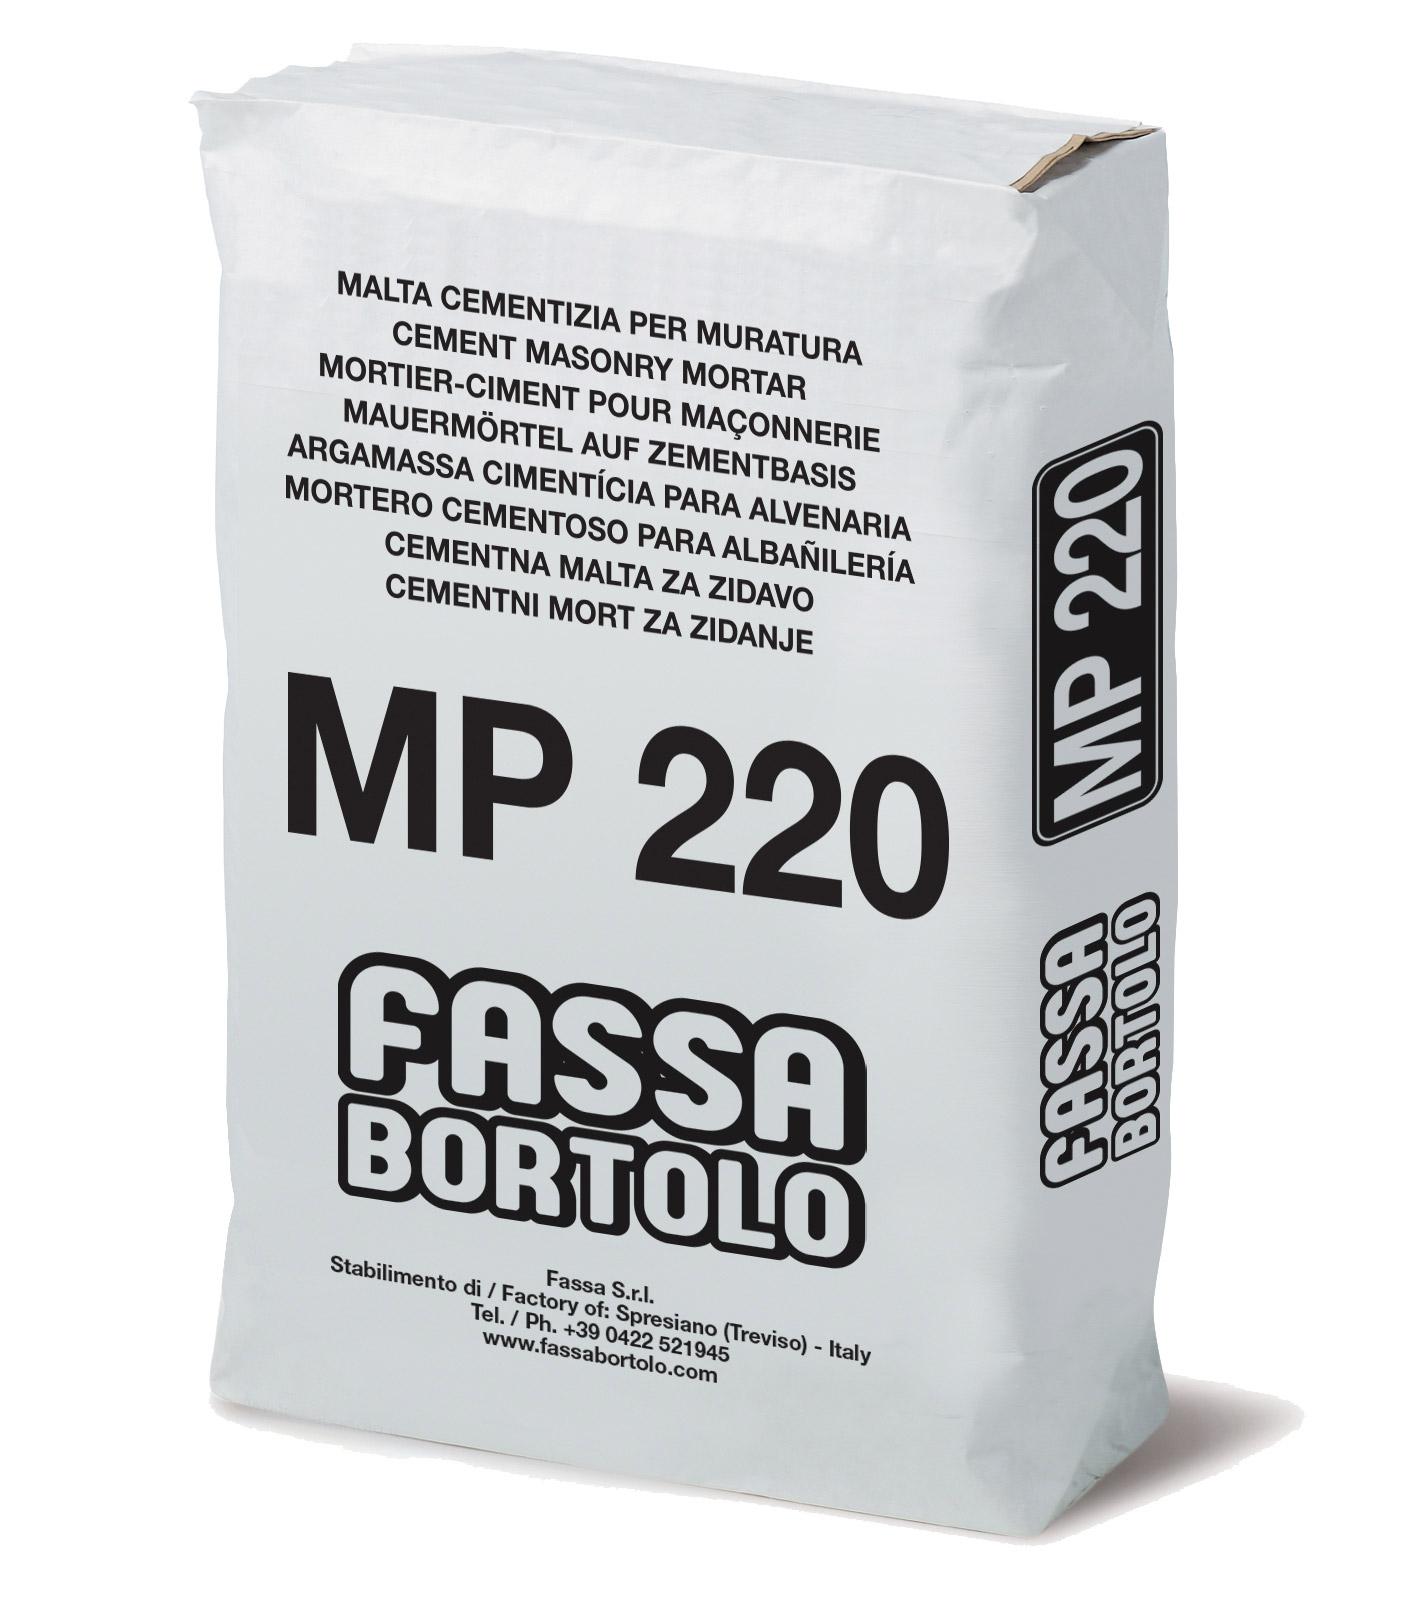 MP 220